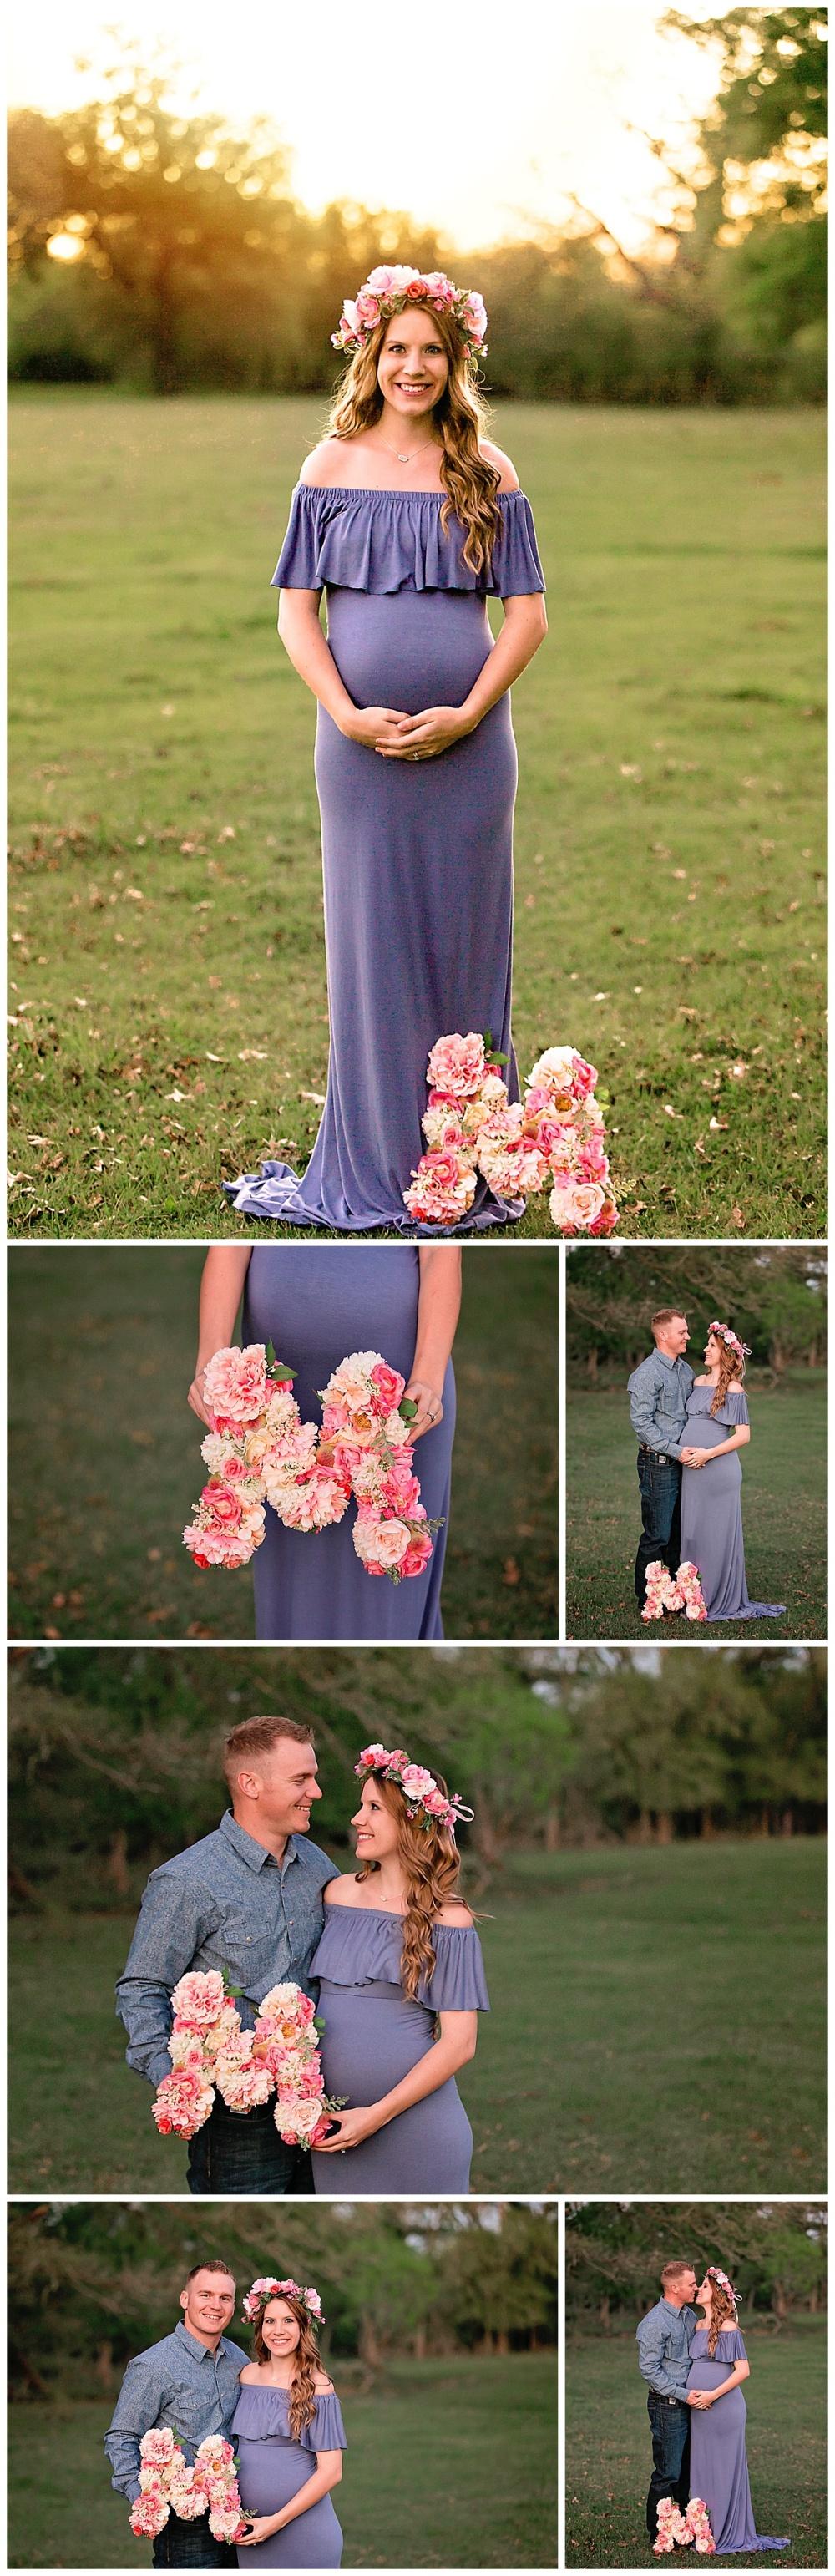 Carly-Barton-Photography-Geronimo-Oaks-Wedding-Venue-Texas-Hill-Country-Ronnie-Sarah_0143.jpg